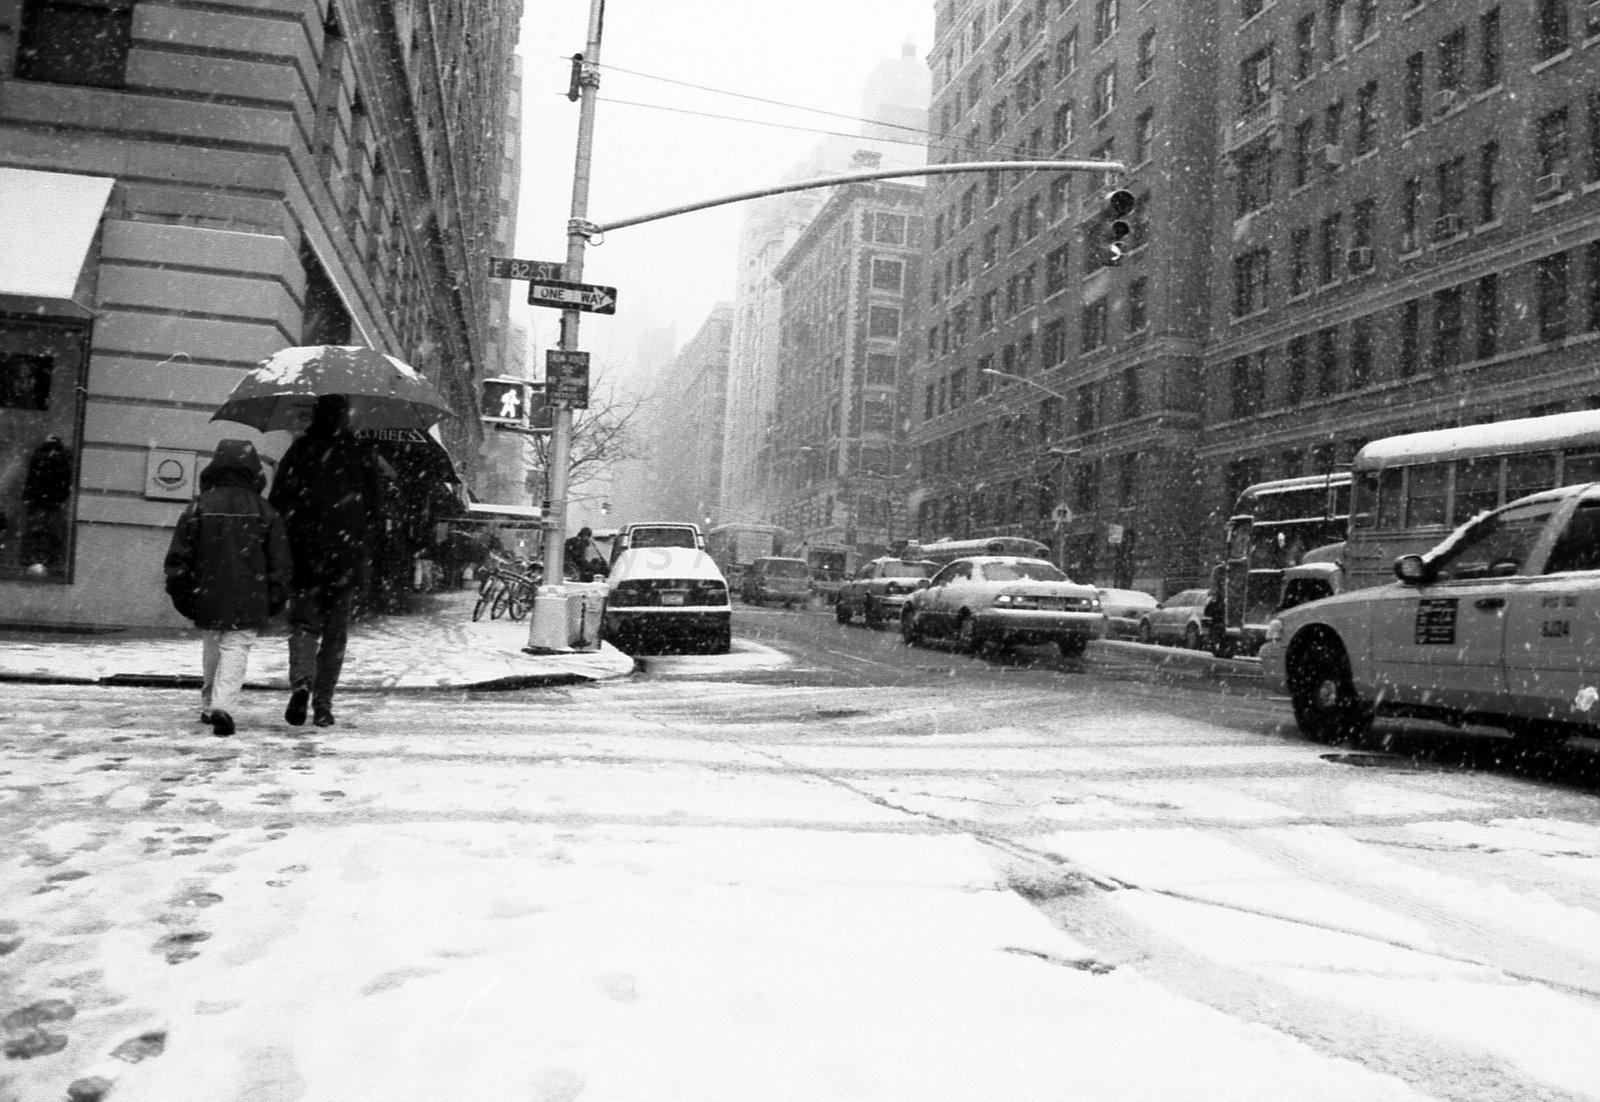 Monochrome New York Roads Cars Taxi Winter Snow People Umbrella